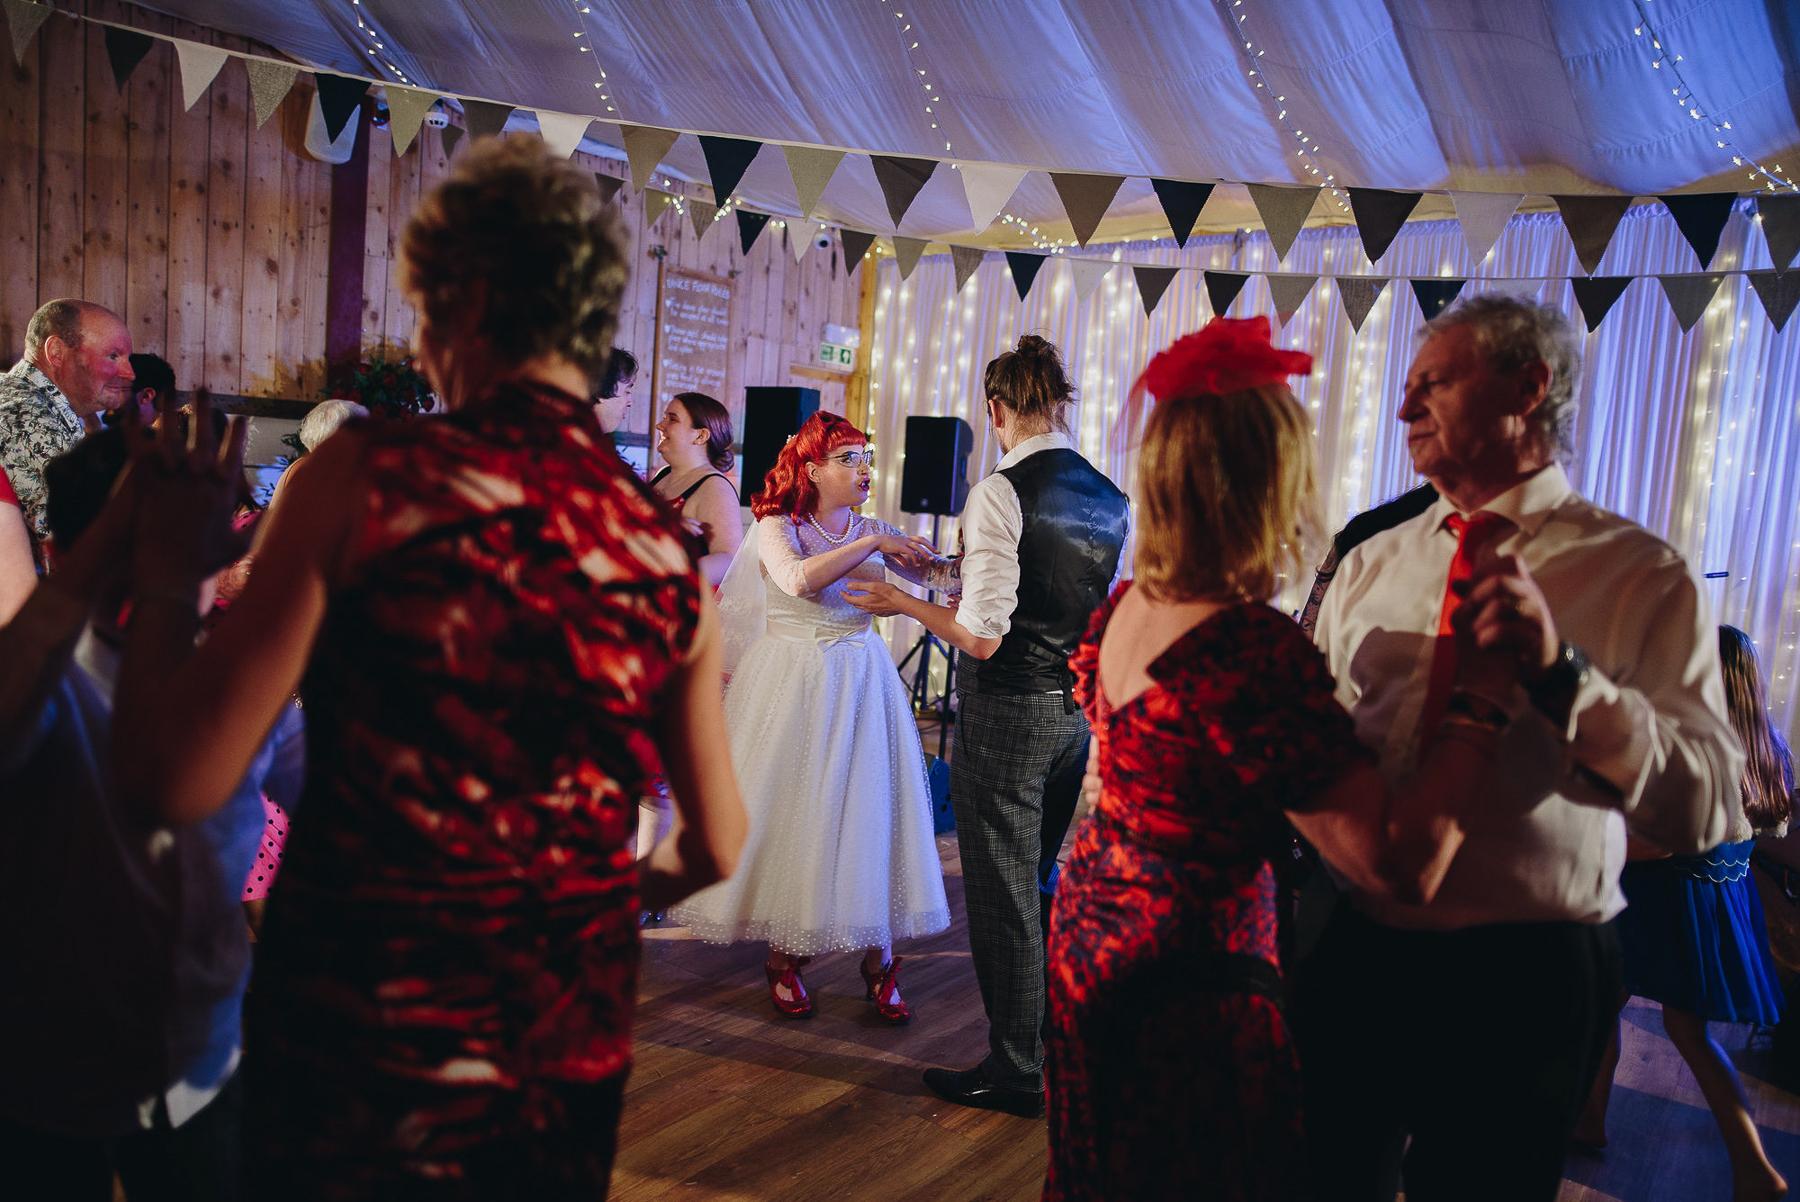 Wellbeing_Farm_Wedding_Photography_The_Pin-Up_Bride_Lara_Shaun-145.jpg